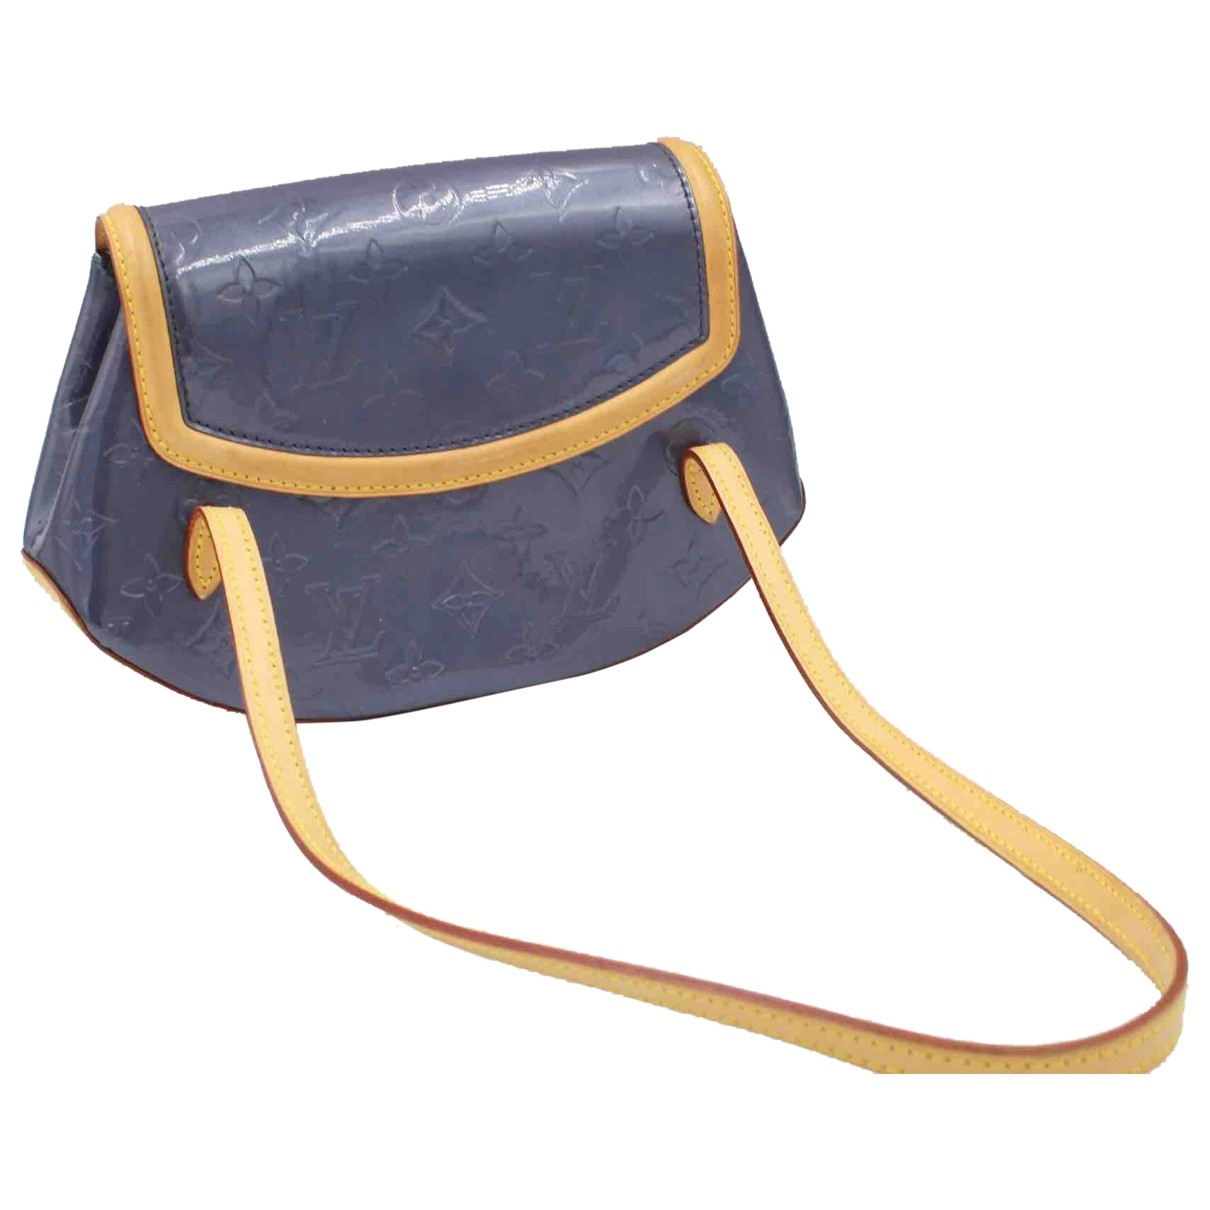 Louis Vuitton Biscayne Bay Purple Patent leather handbag for Women \N